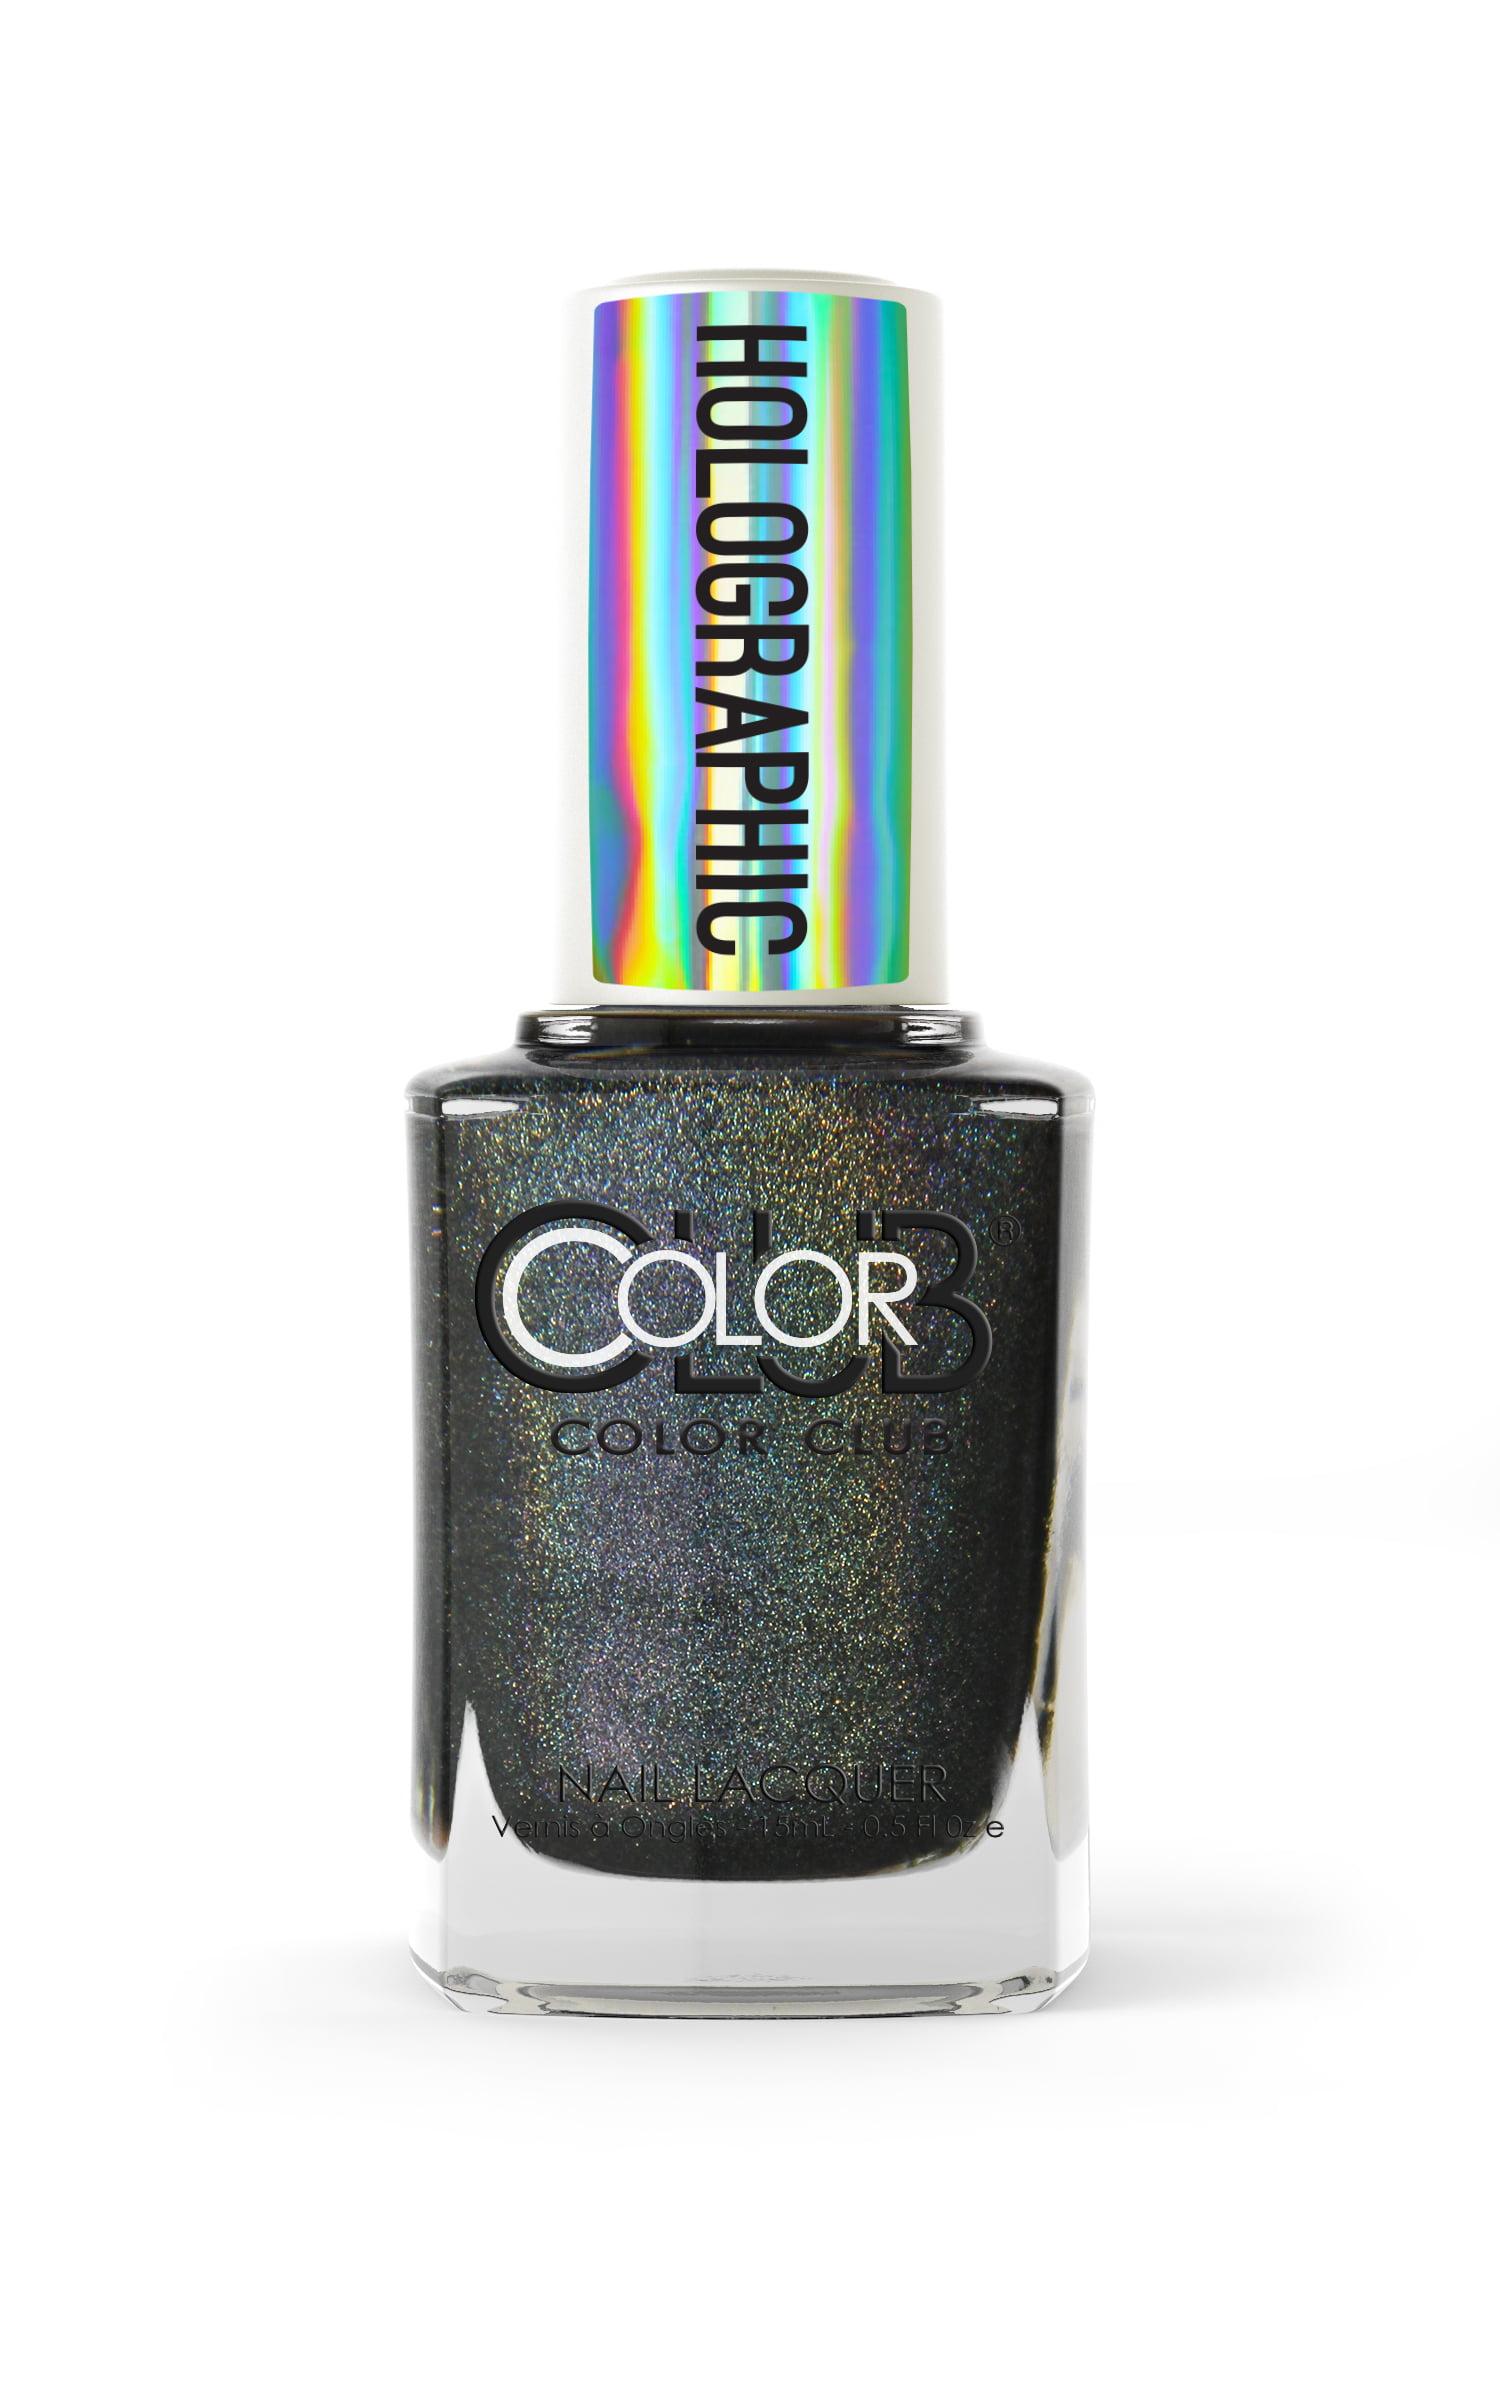 Color Club Holographic Nail Polish, Black Magic - Walmart.com